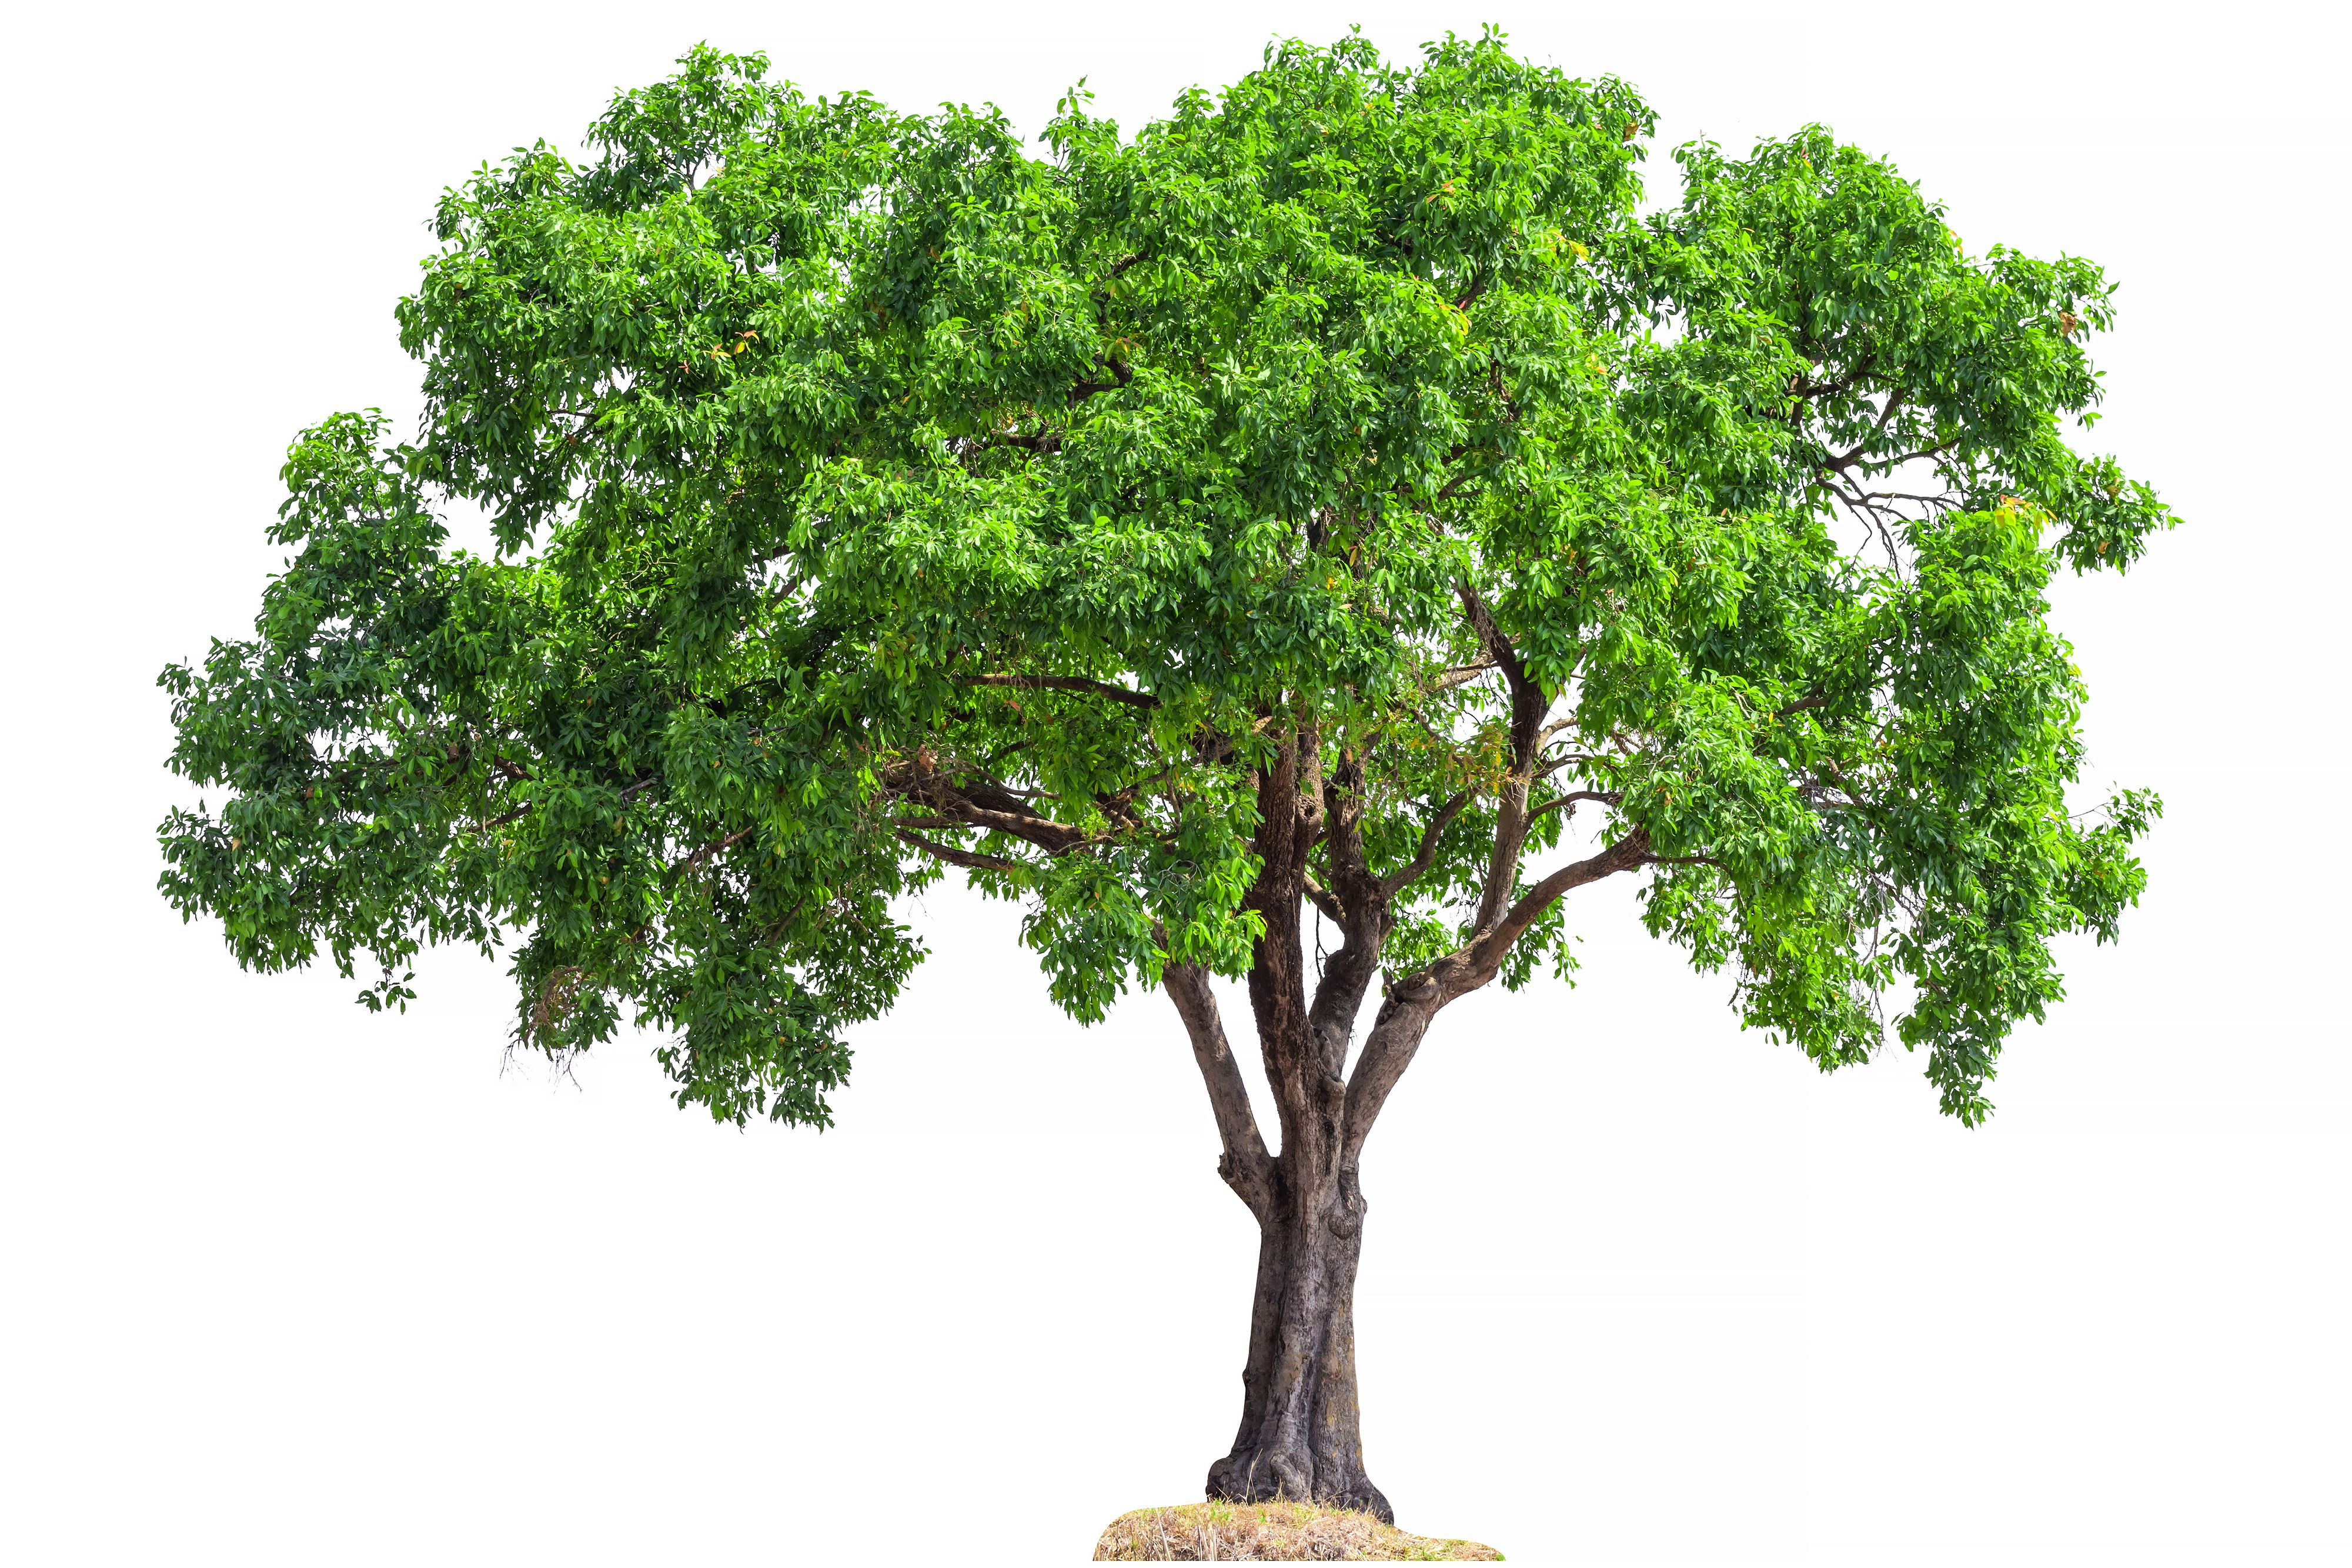 Tree Leaf Chart: Shape, Margin, and Venation